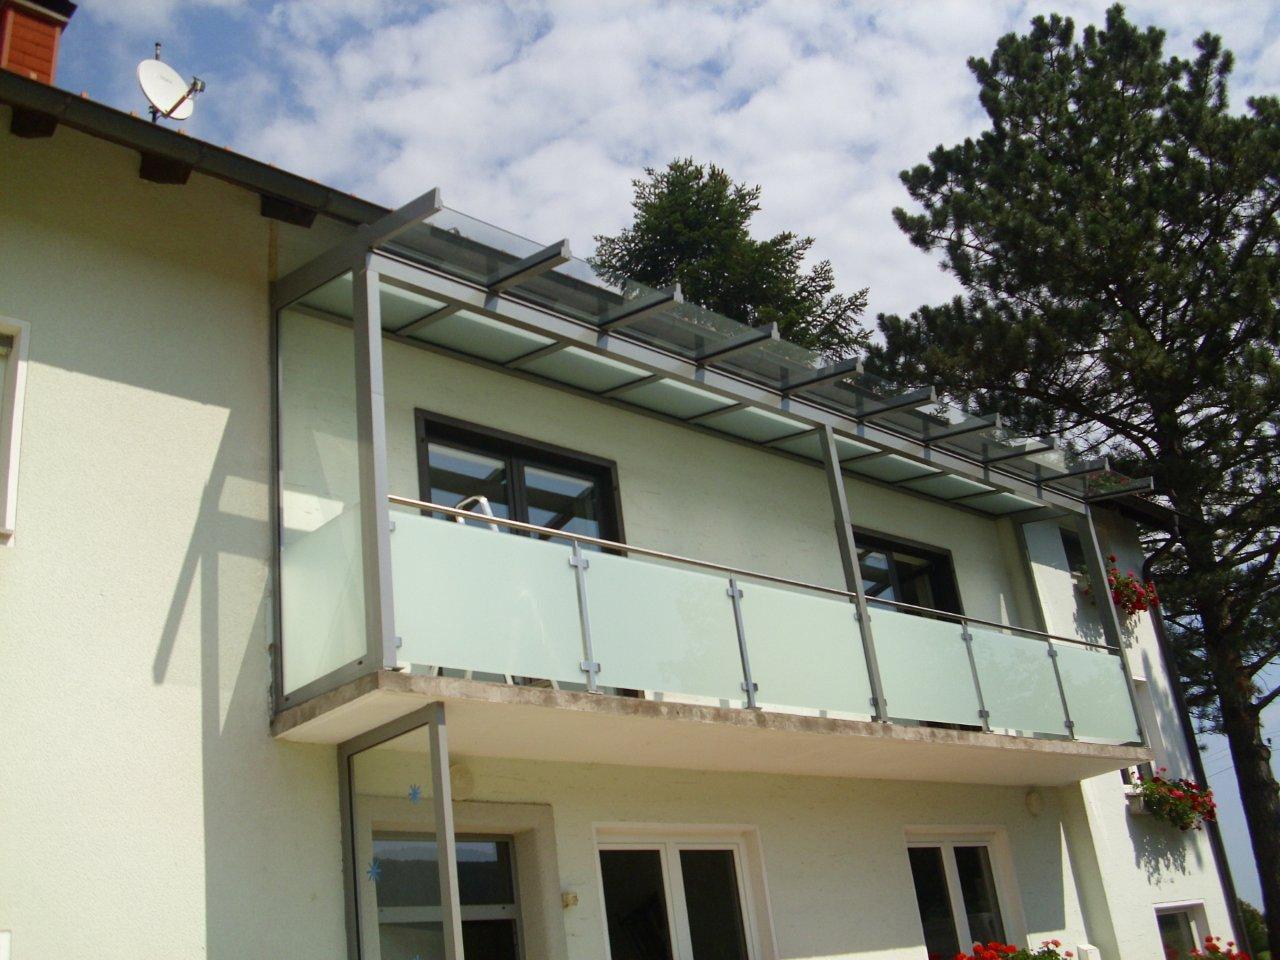 Balkonüberdachung Bilder